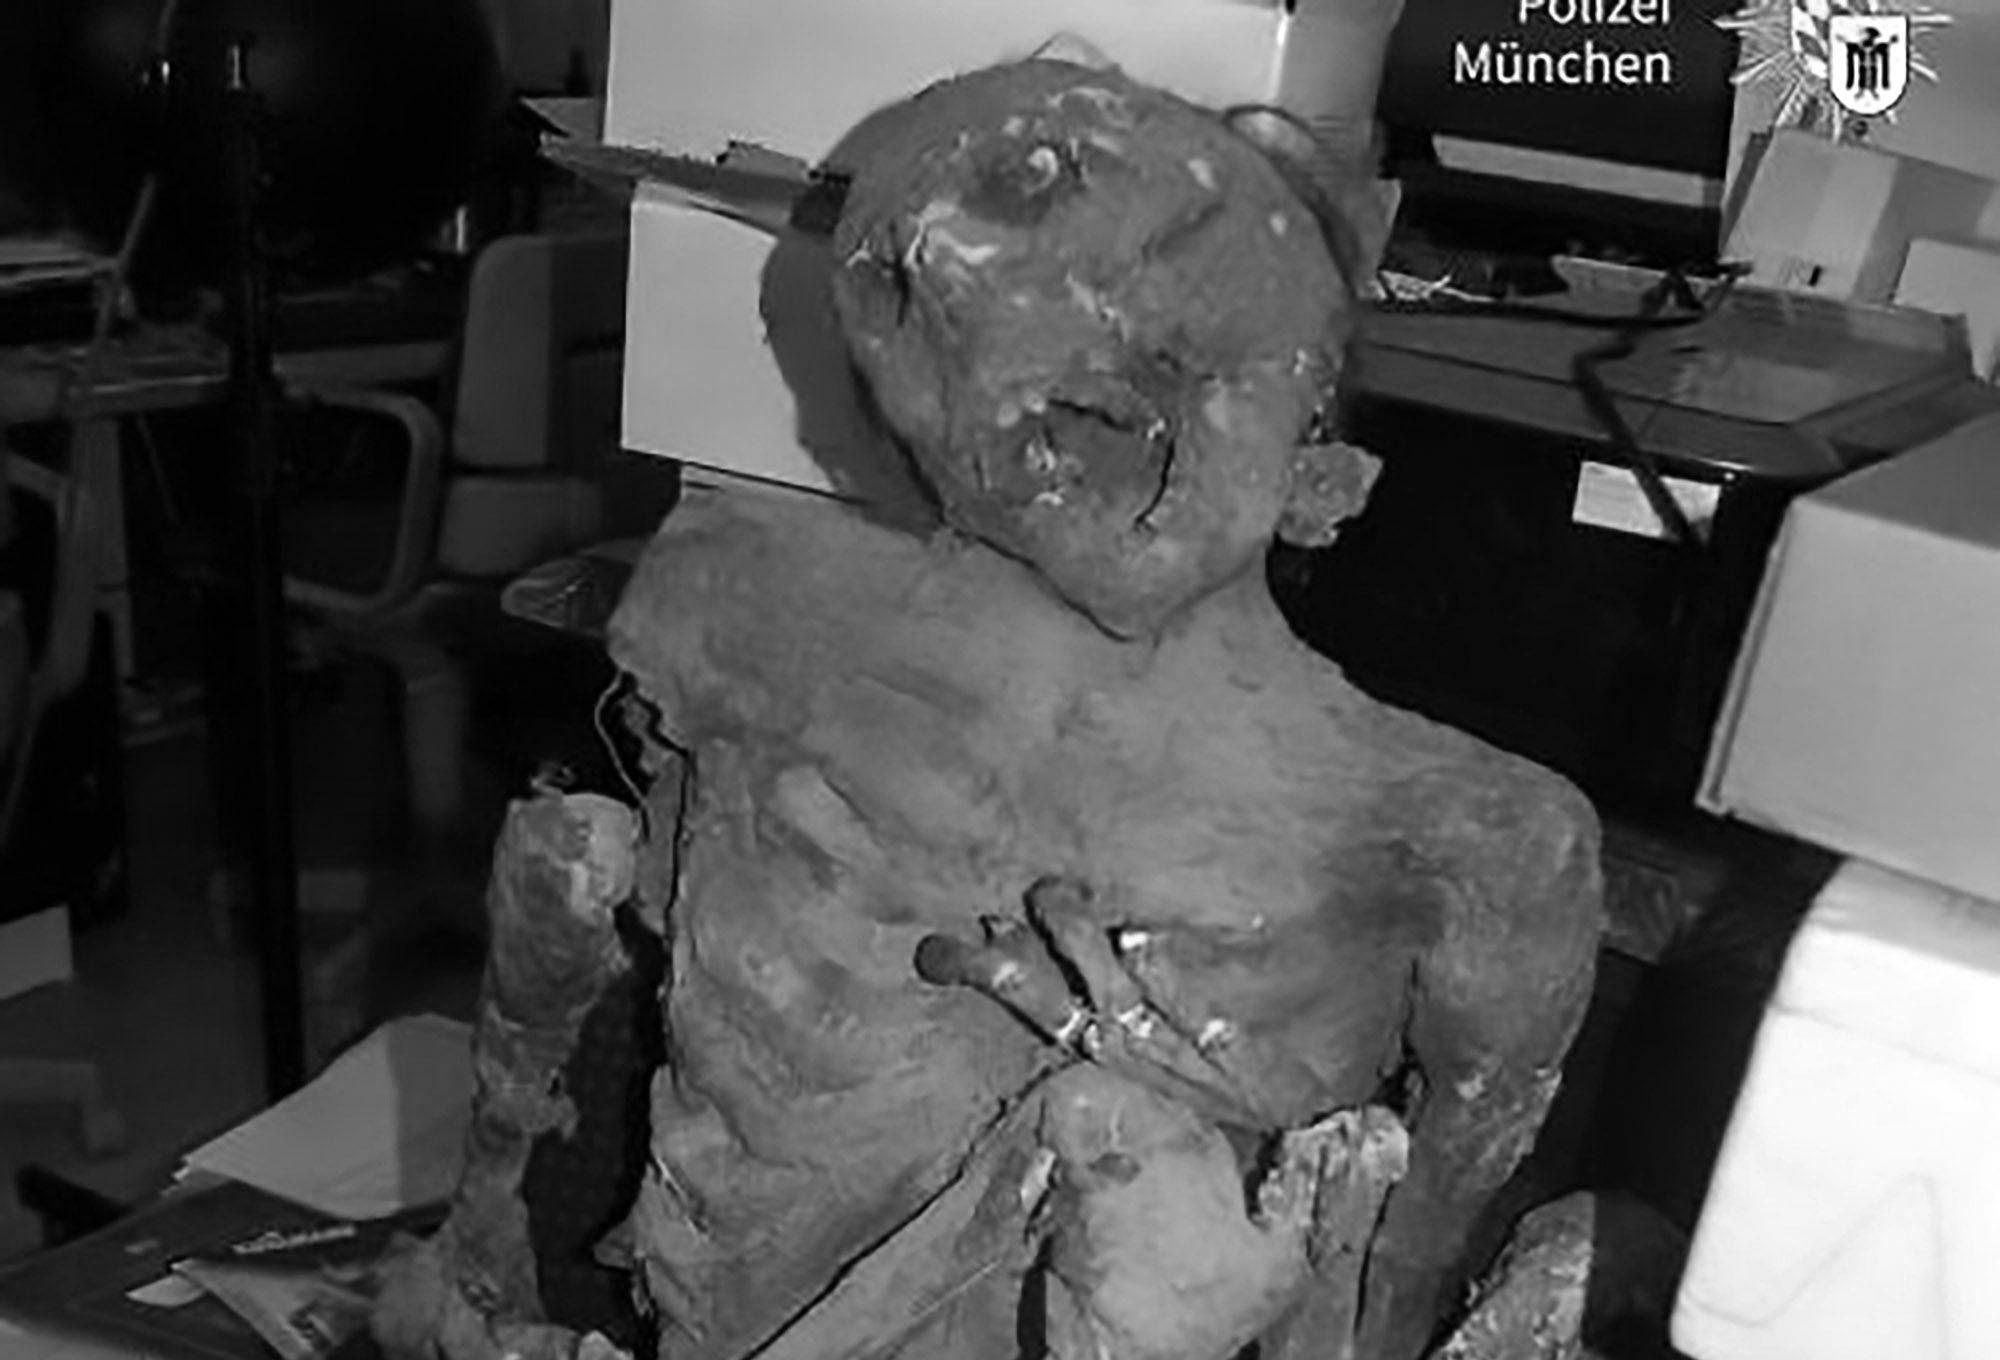 Terrified OAP Calls Cops After Finding Fake Mummy Prop